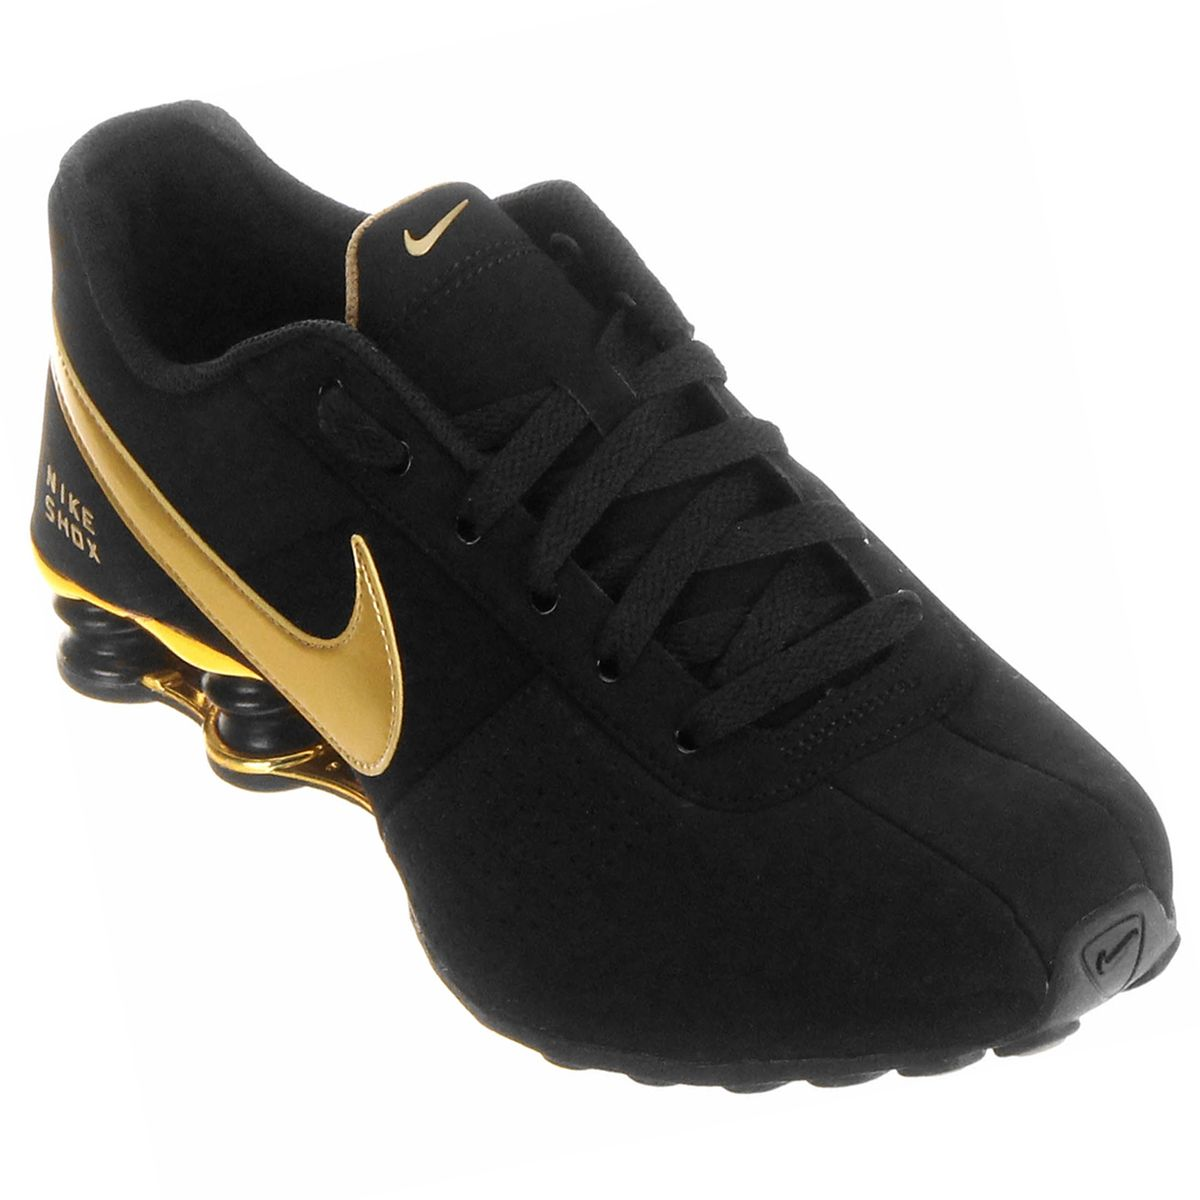 872966eb3a9 Tênis Nike Shox Deliver Dourado